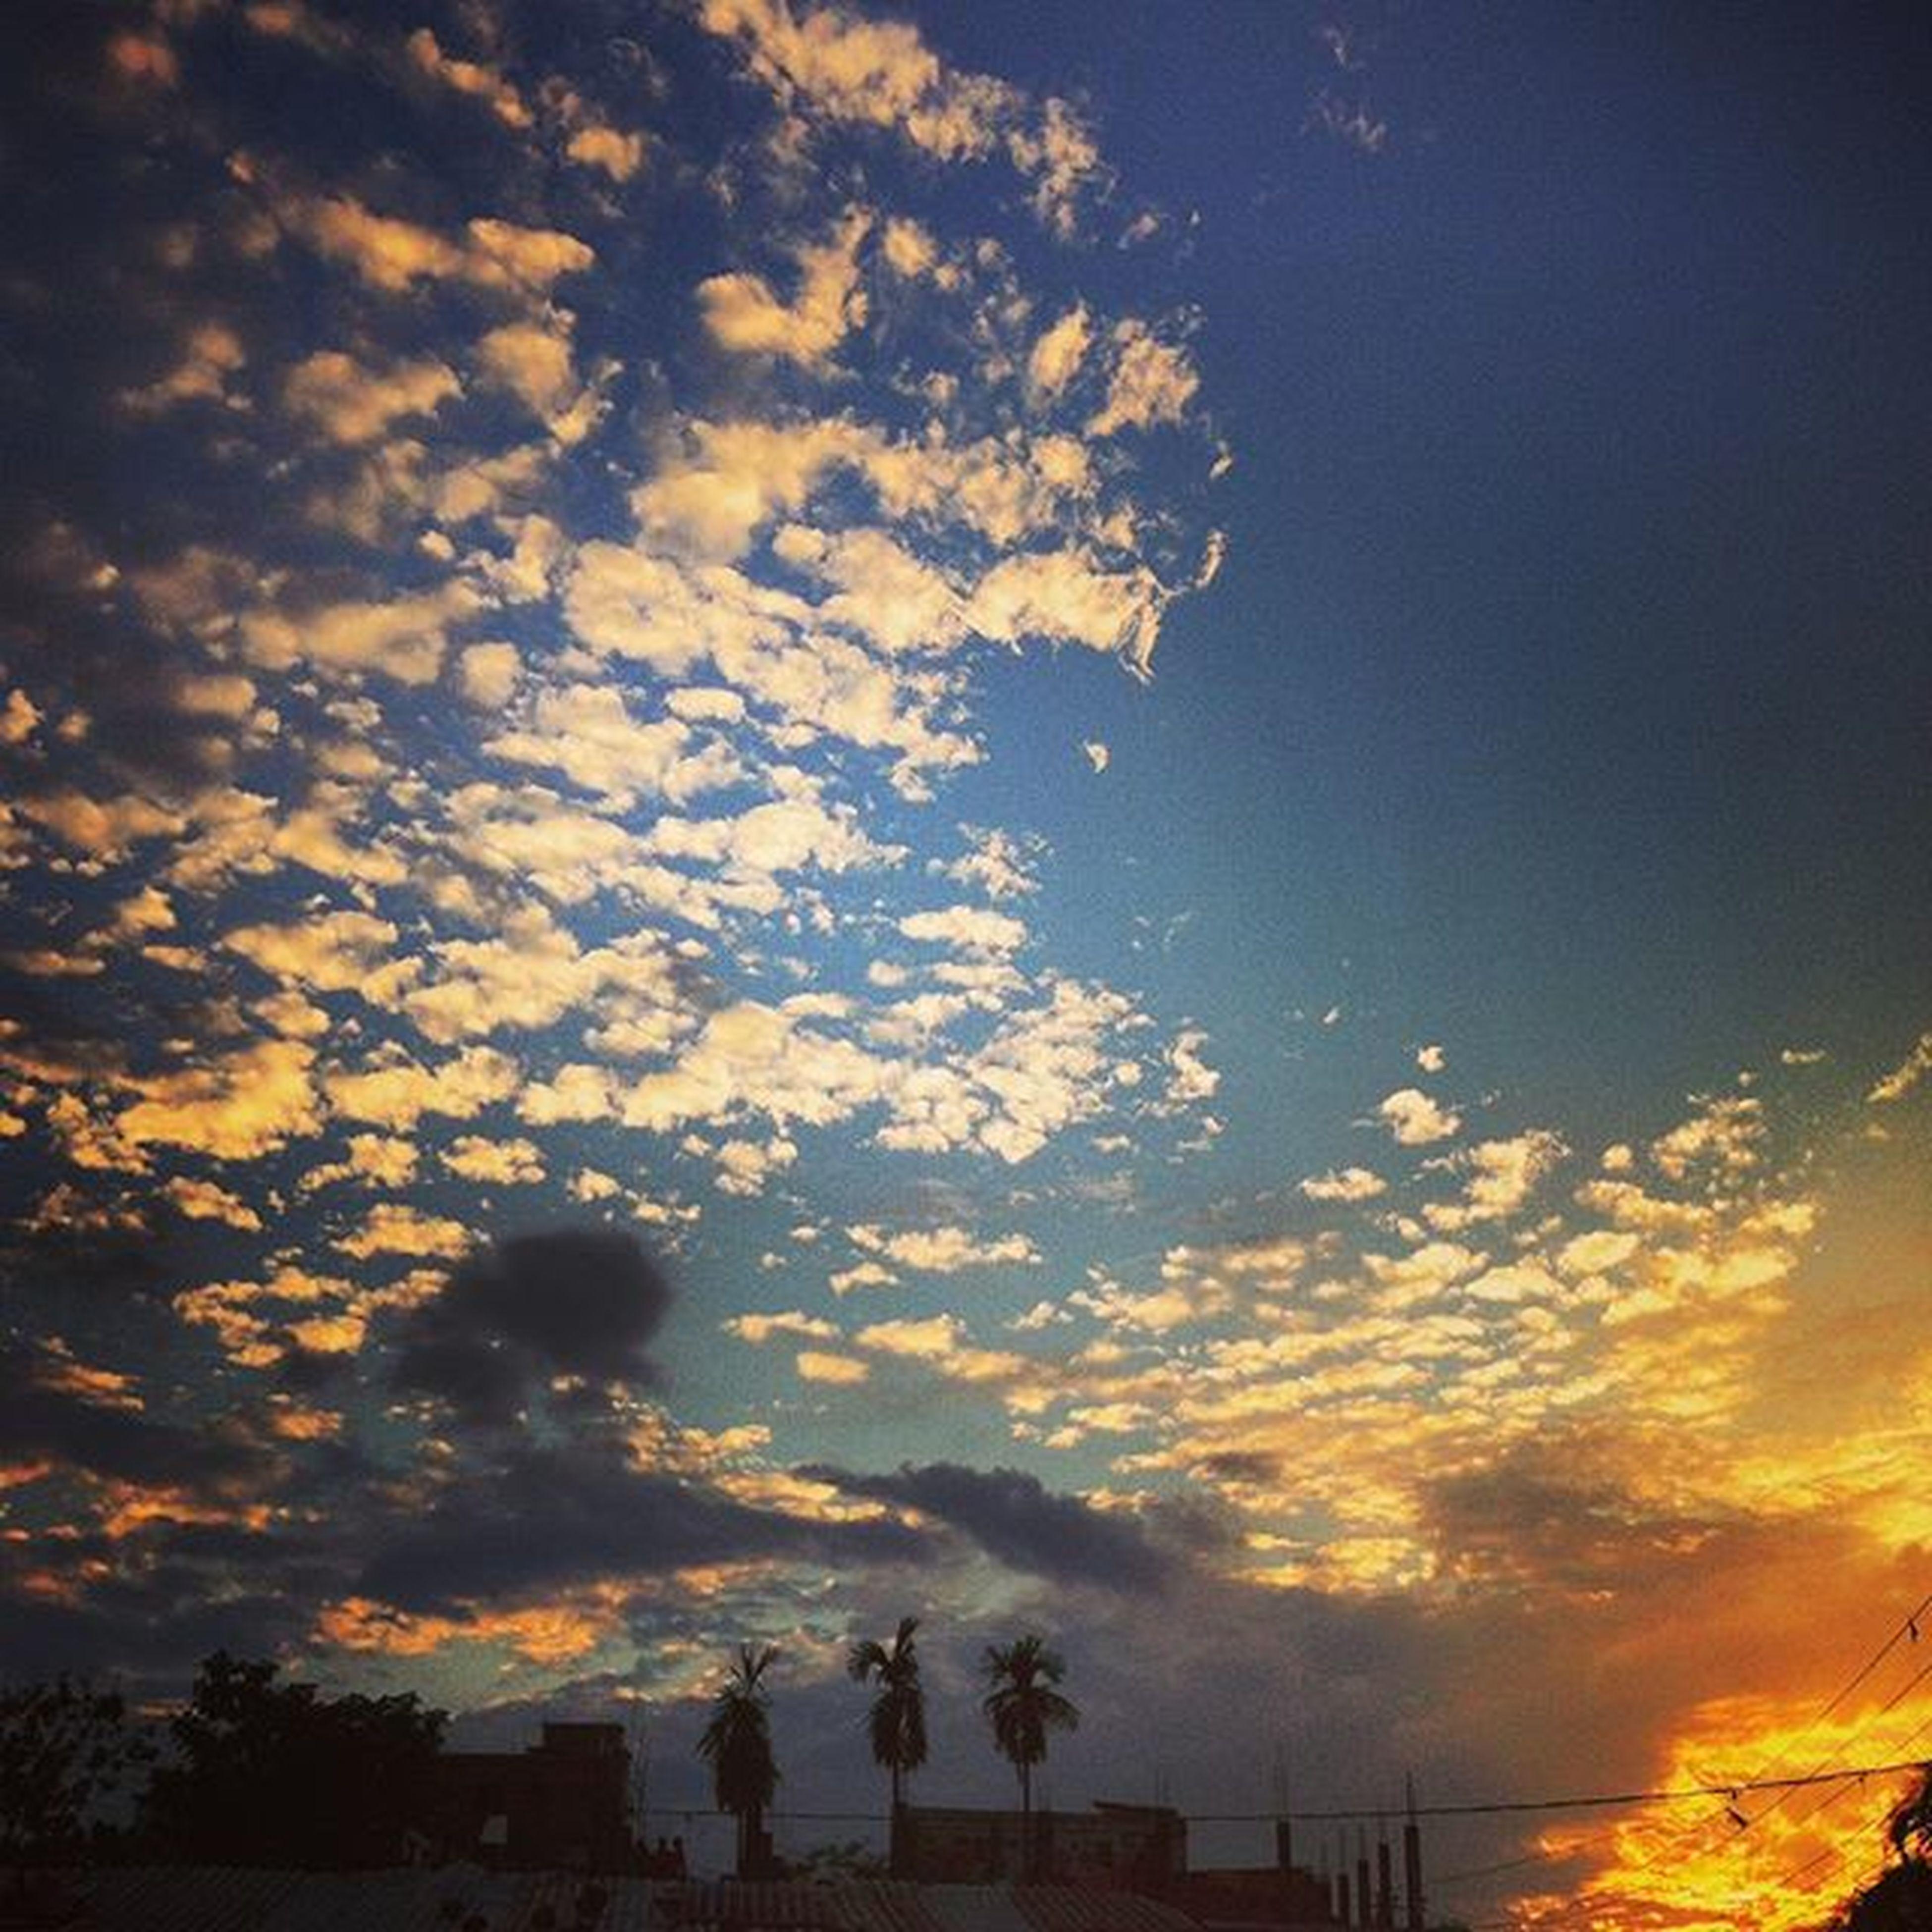 sky art ! 13.10.2015 Js Jashimsalam Photos Photographer Photojournalist Documentary Light Sky Art Cloud Sunset Instgram Sunset Instaart Natgeo Chittagong Skyscspe Landscape Everydaybangladesh